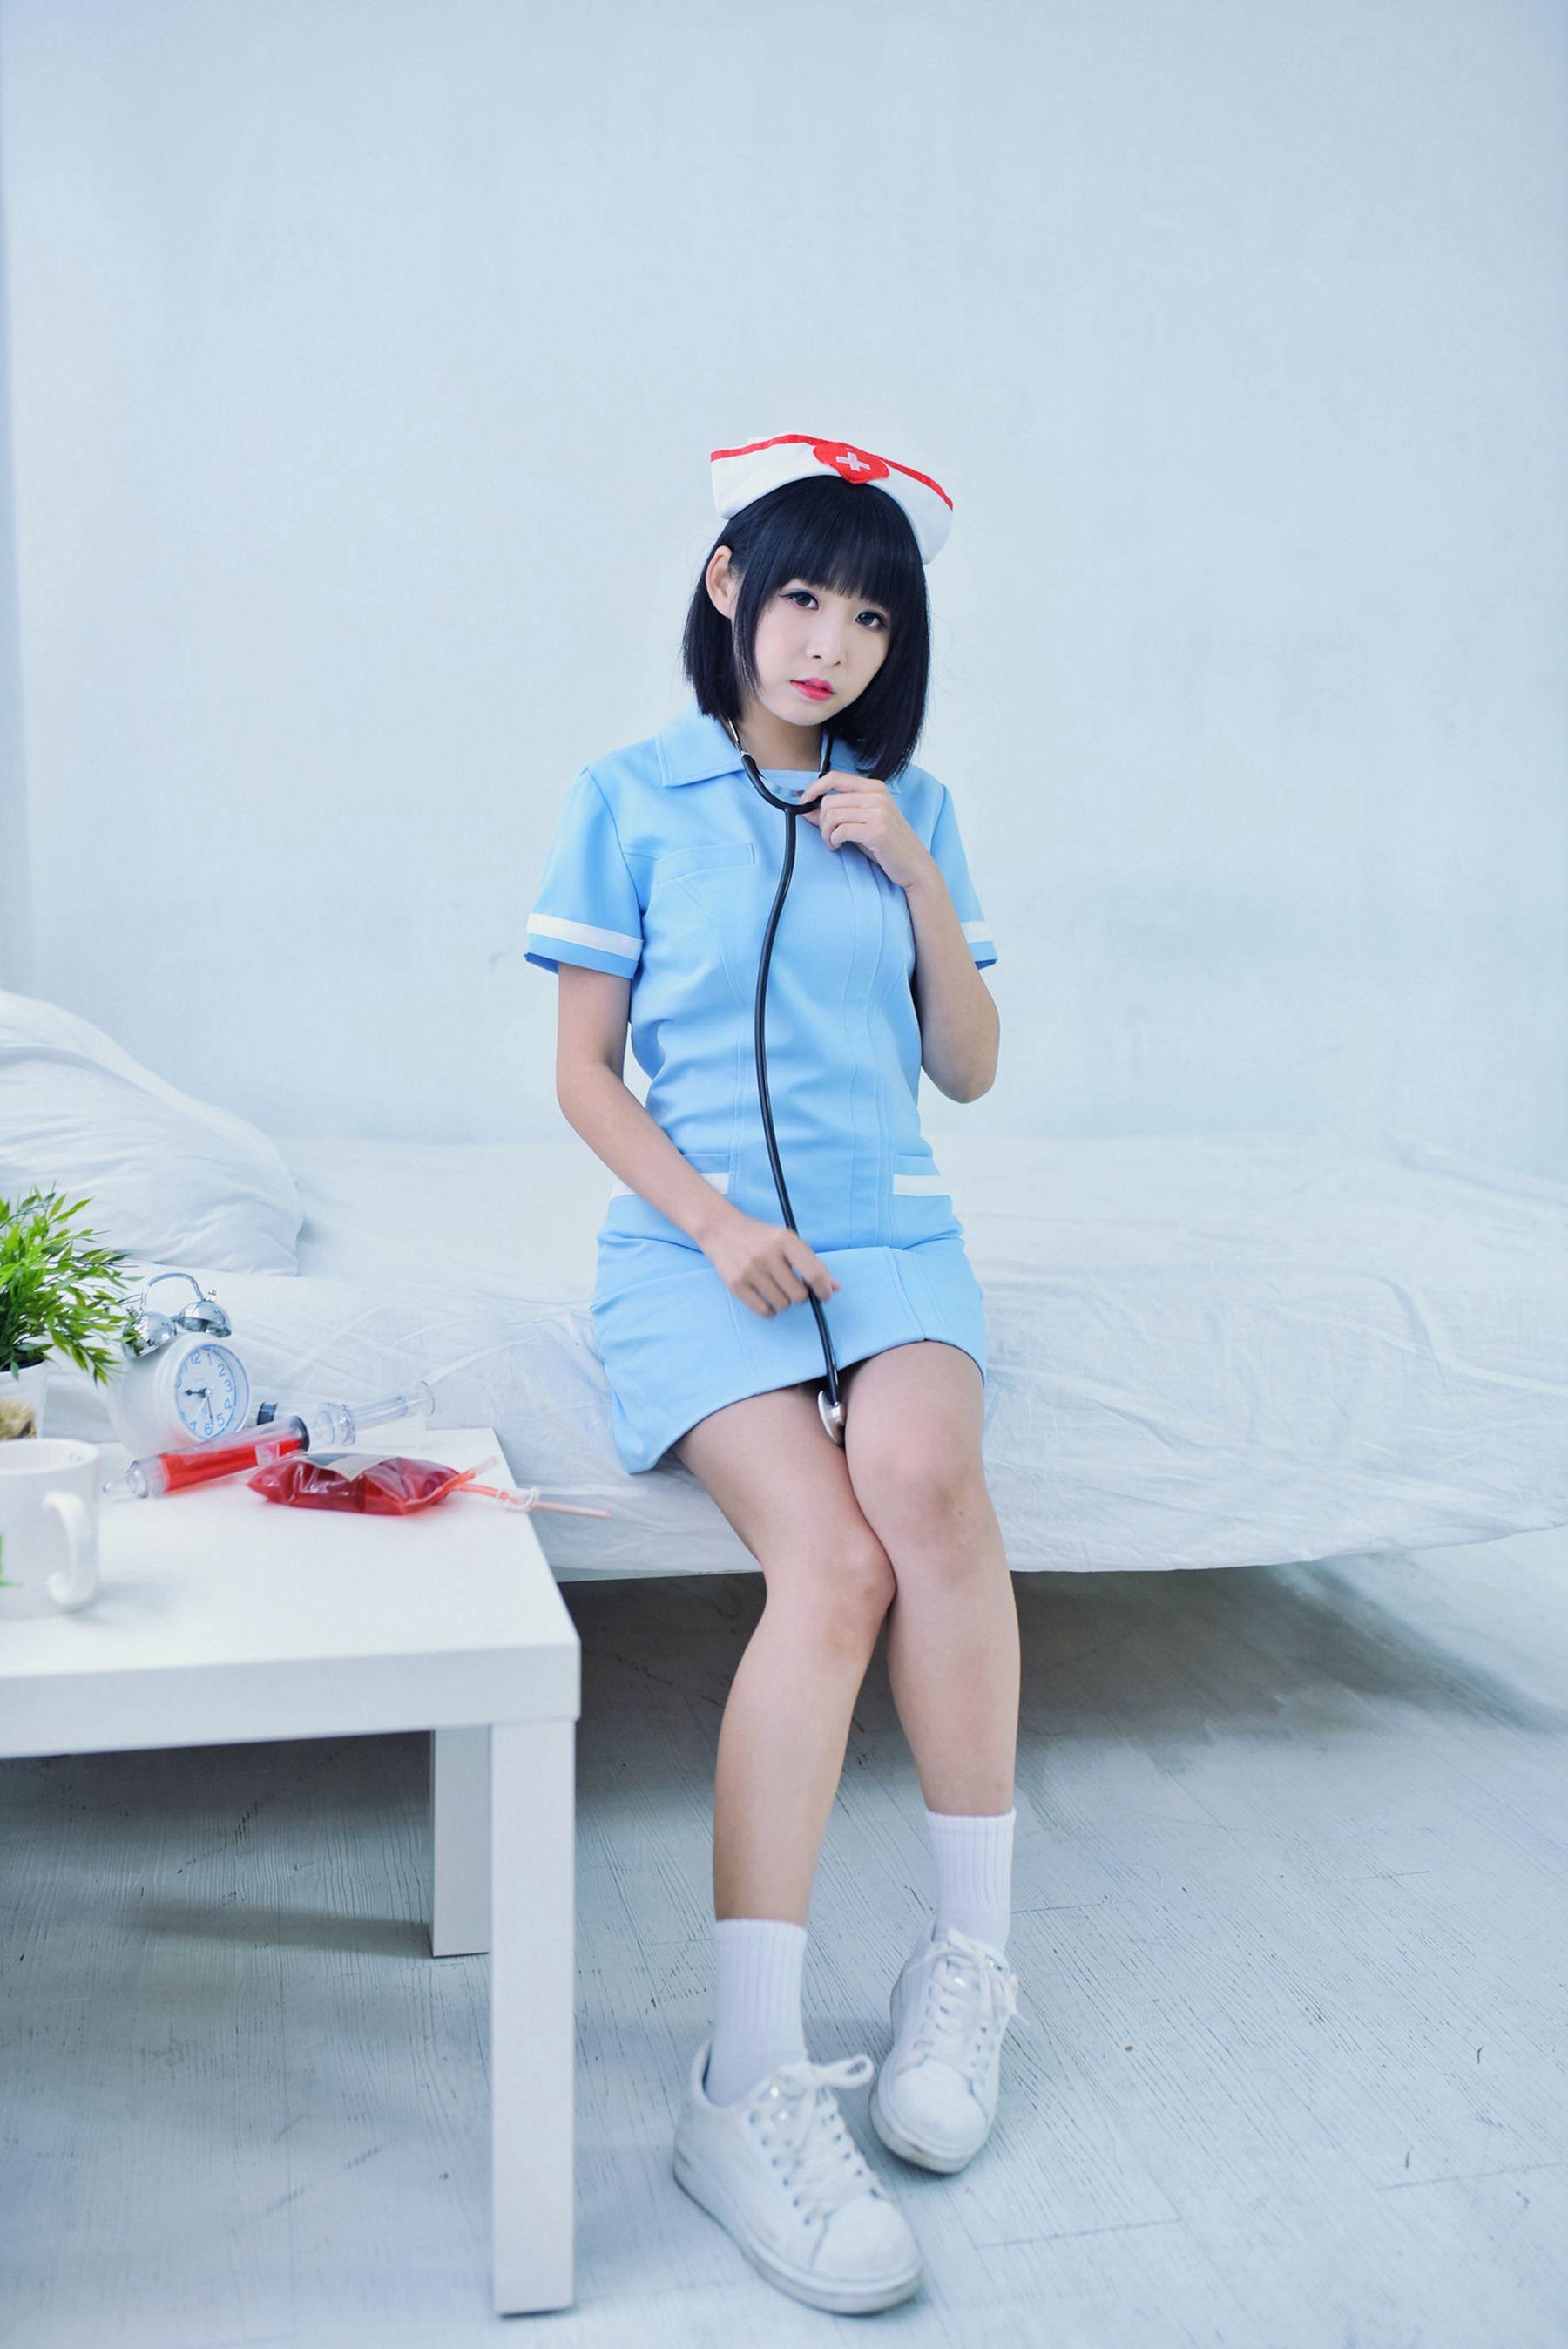 VOL.1977 [台湾正妹]护士制服女仆萌女清纯护士制服:海琳超高清个人性感漂亮大图(40P)